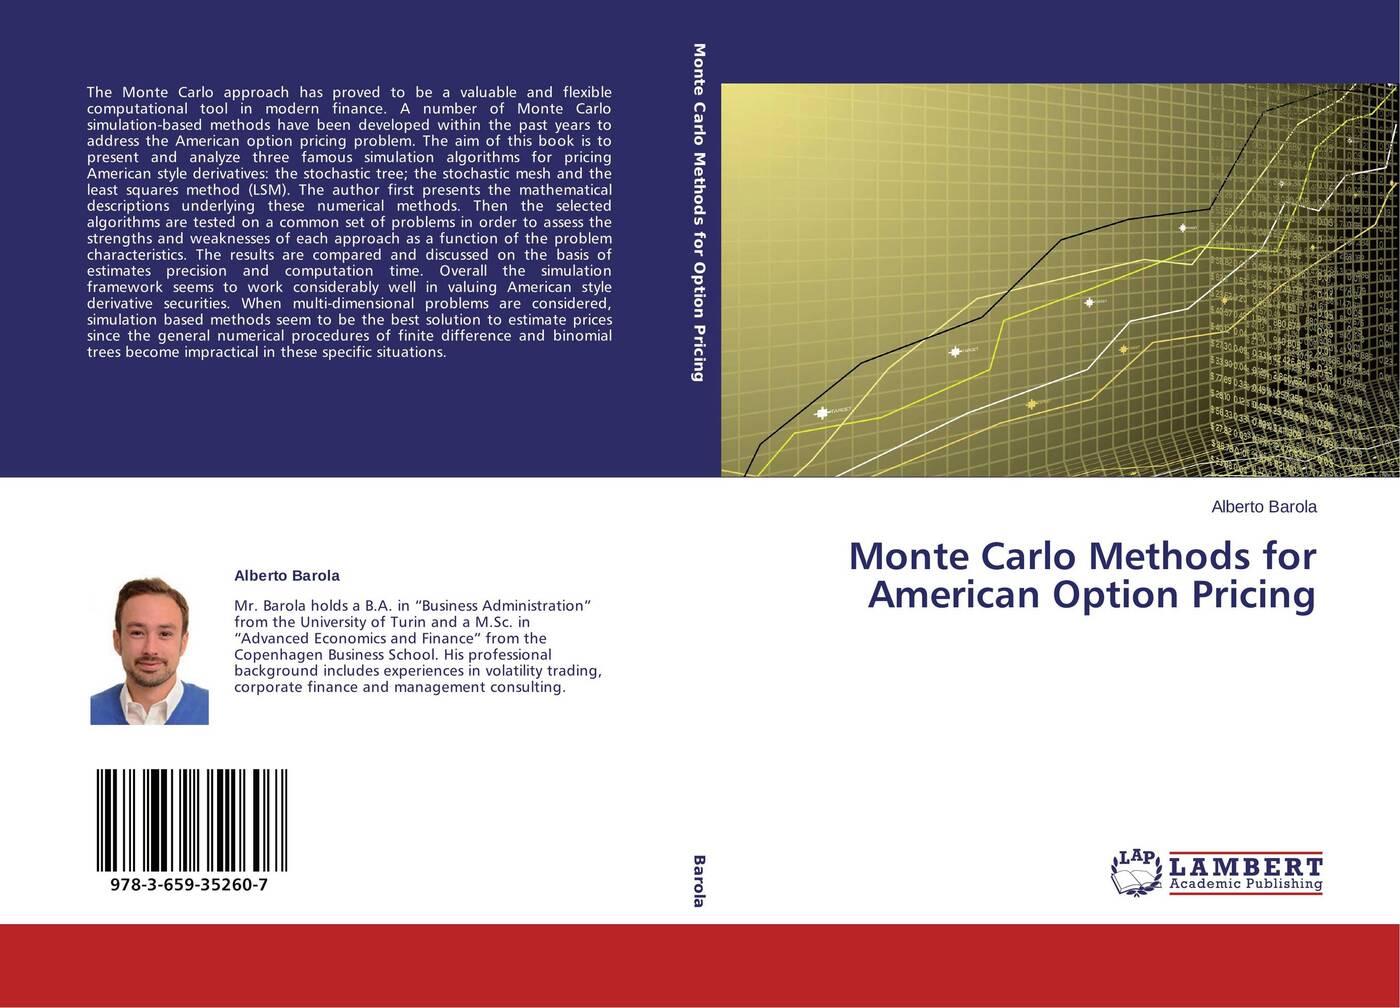 Alberto Barola Monte Carlo Methods for American Option Pricing mario rometsch quasi monte carlo methods in finance